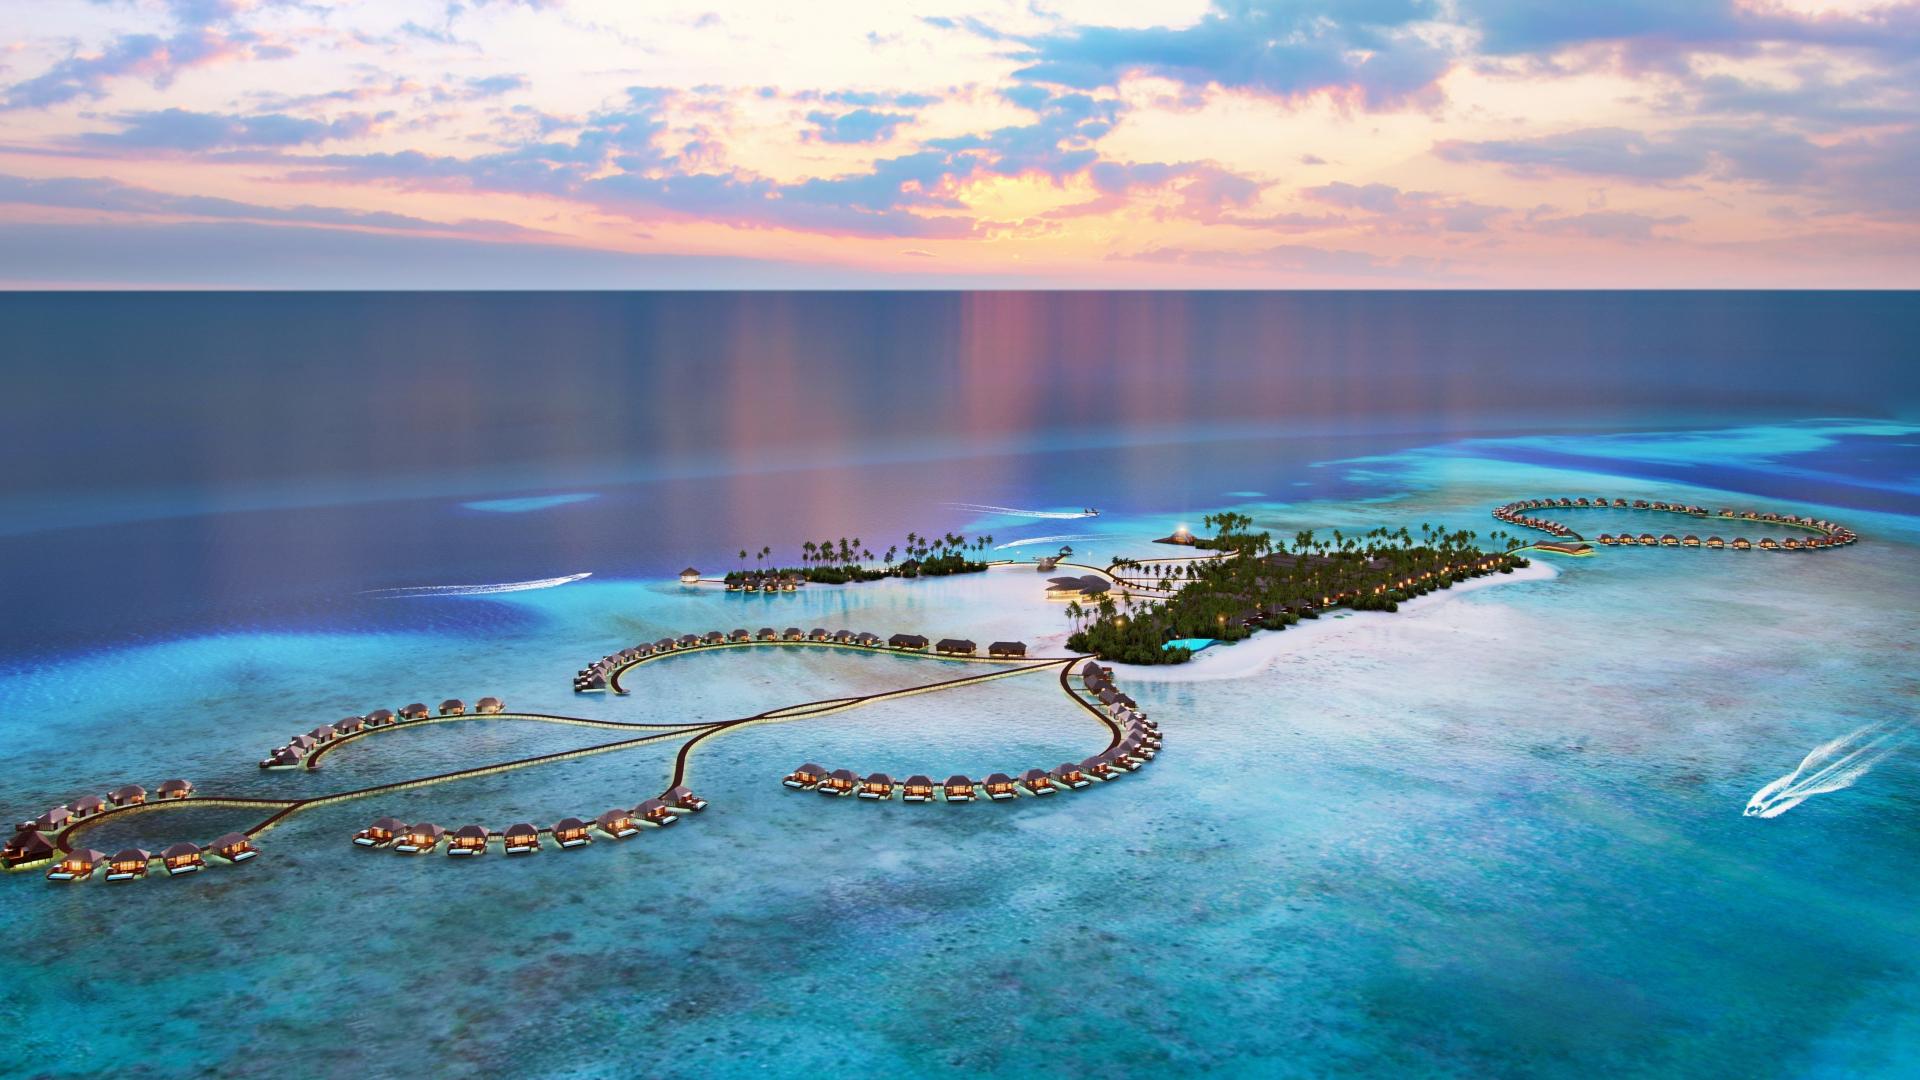 Samsung Galaxy S X 1920 Cars Download 1920x1080 Wallpaper Maldives Resorts Aerial